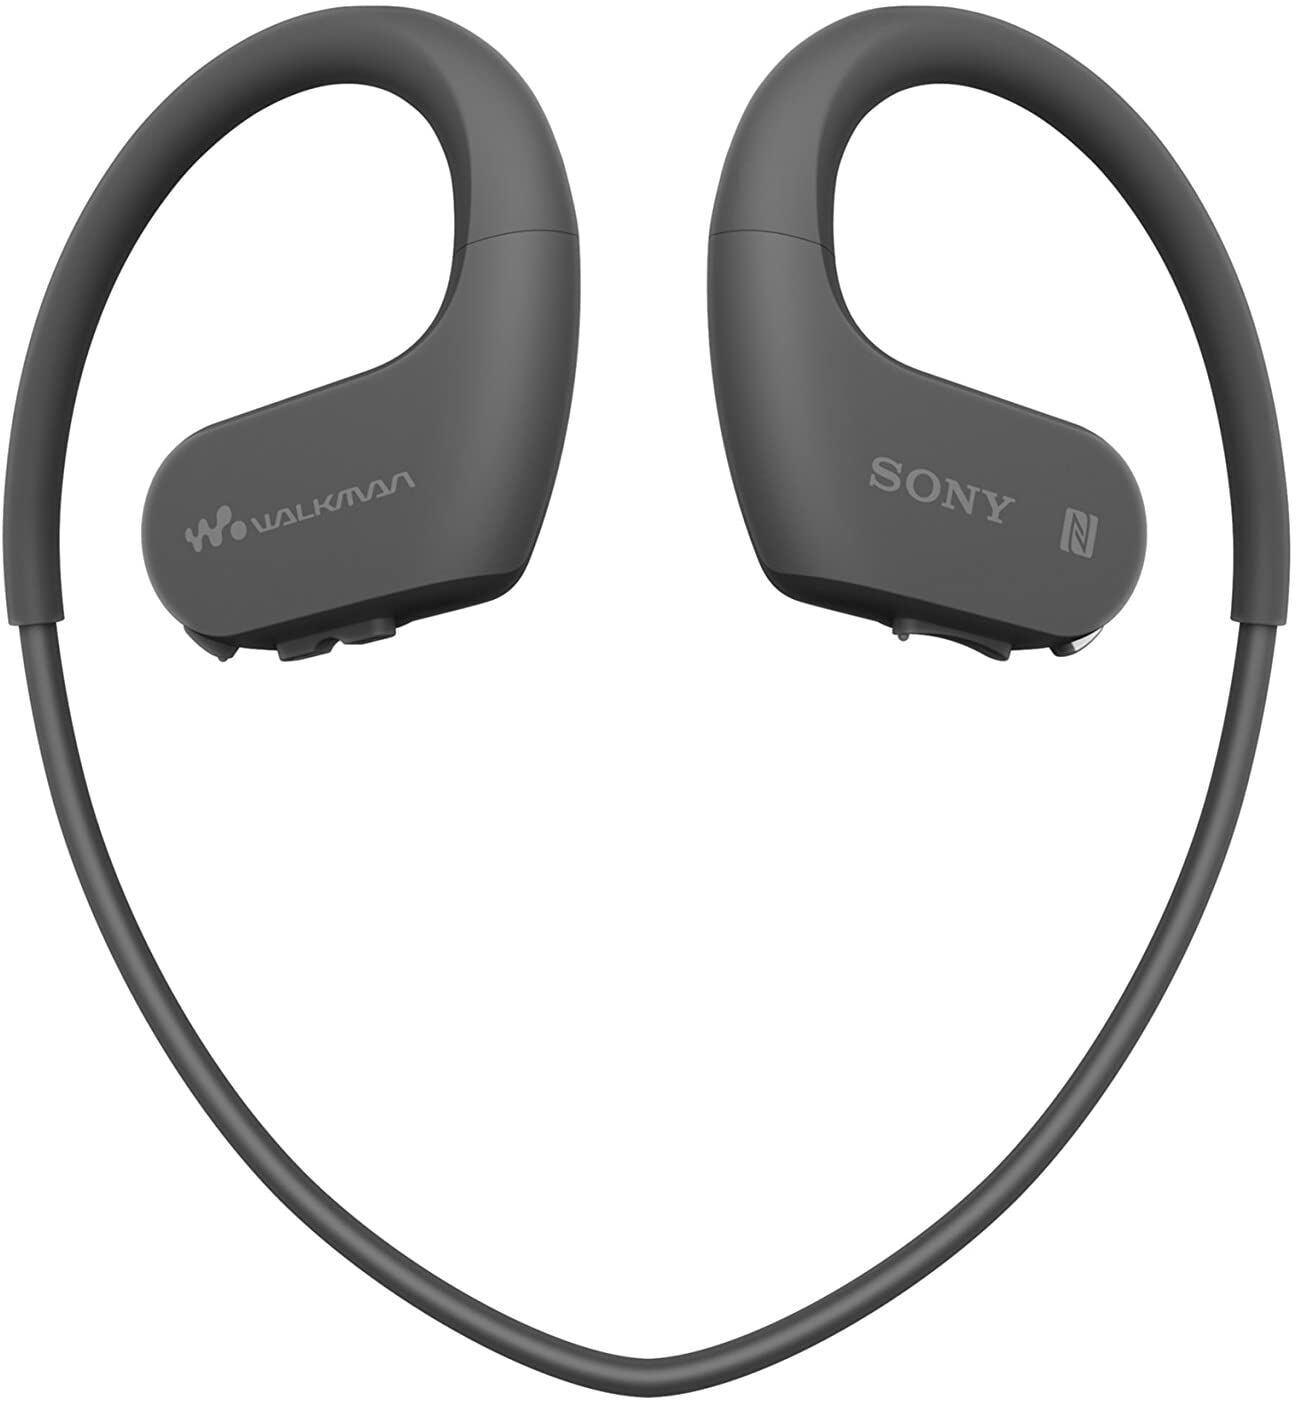 MP3 плеер Sony Walkman NW-WS625 16GB Black (NWWS625B.CEW) фото